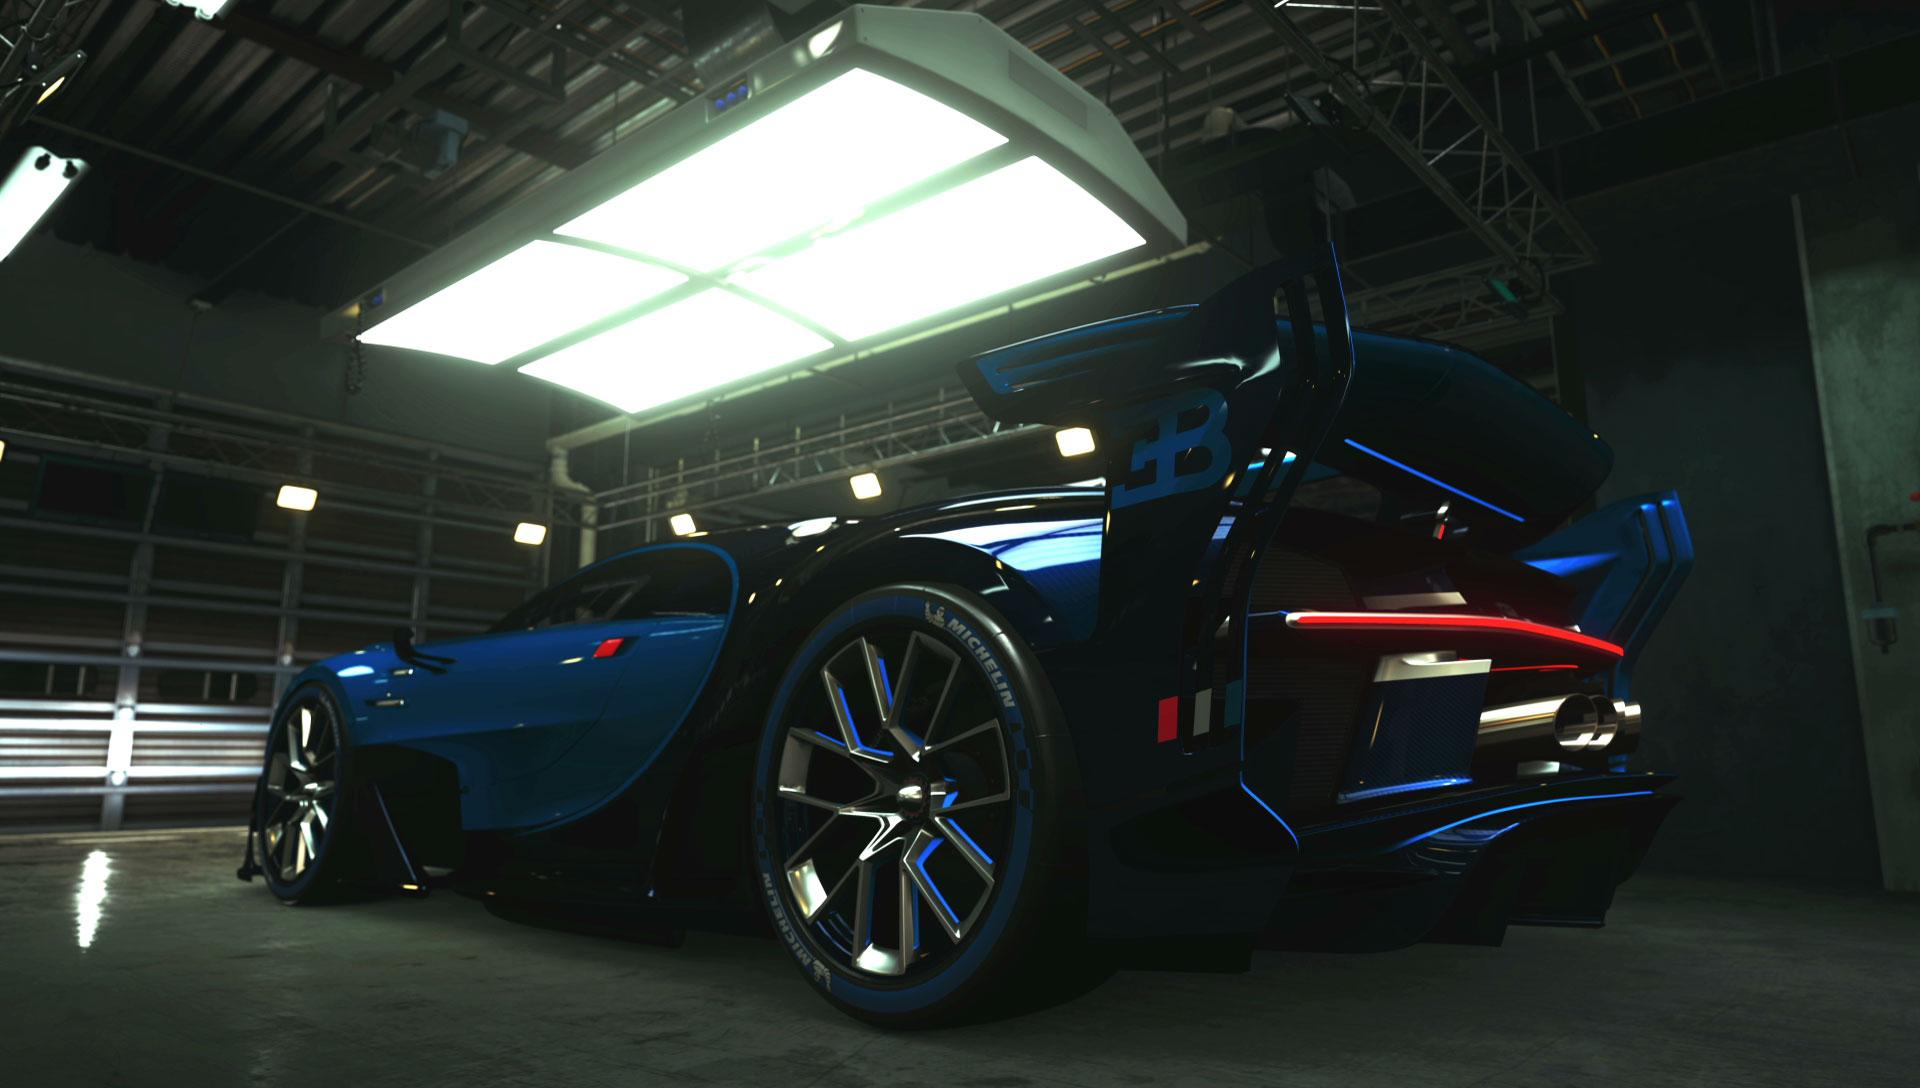 《GT Sport》大型升级补丁发布 新增单人生涯模式